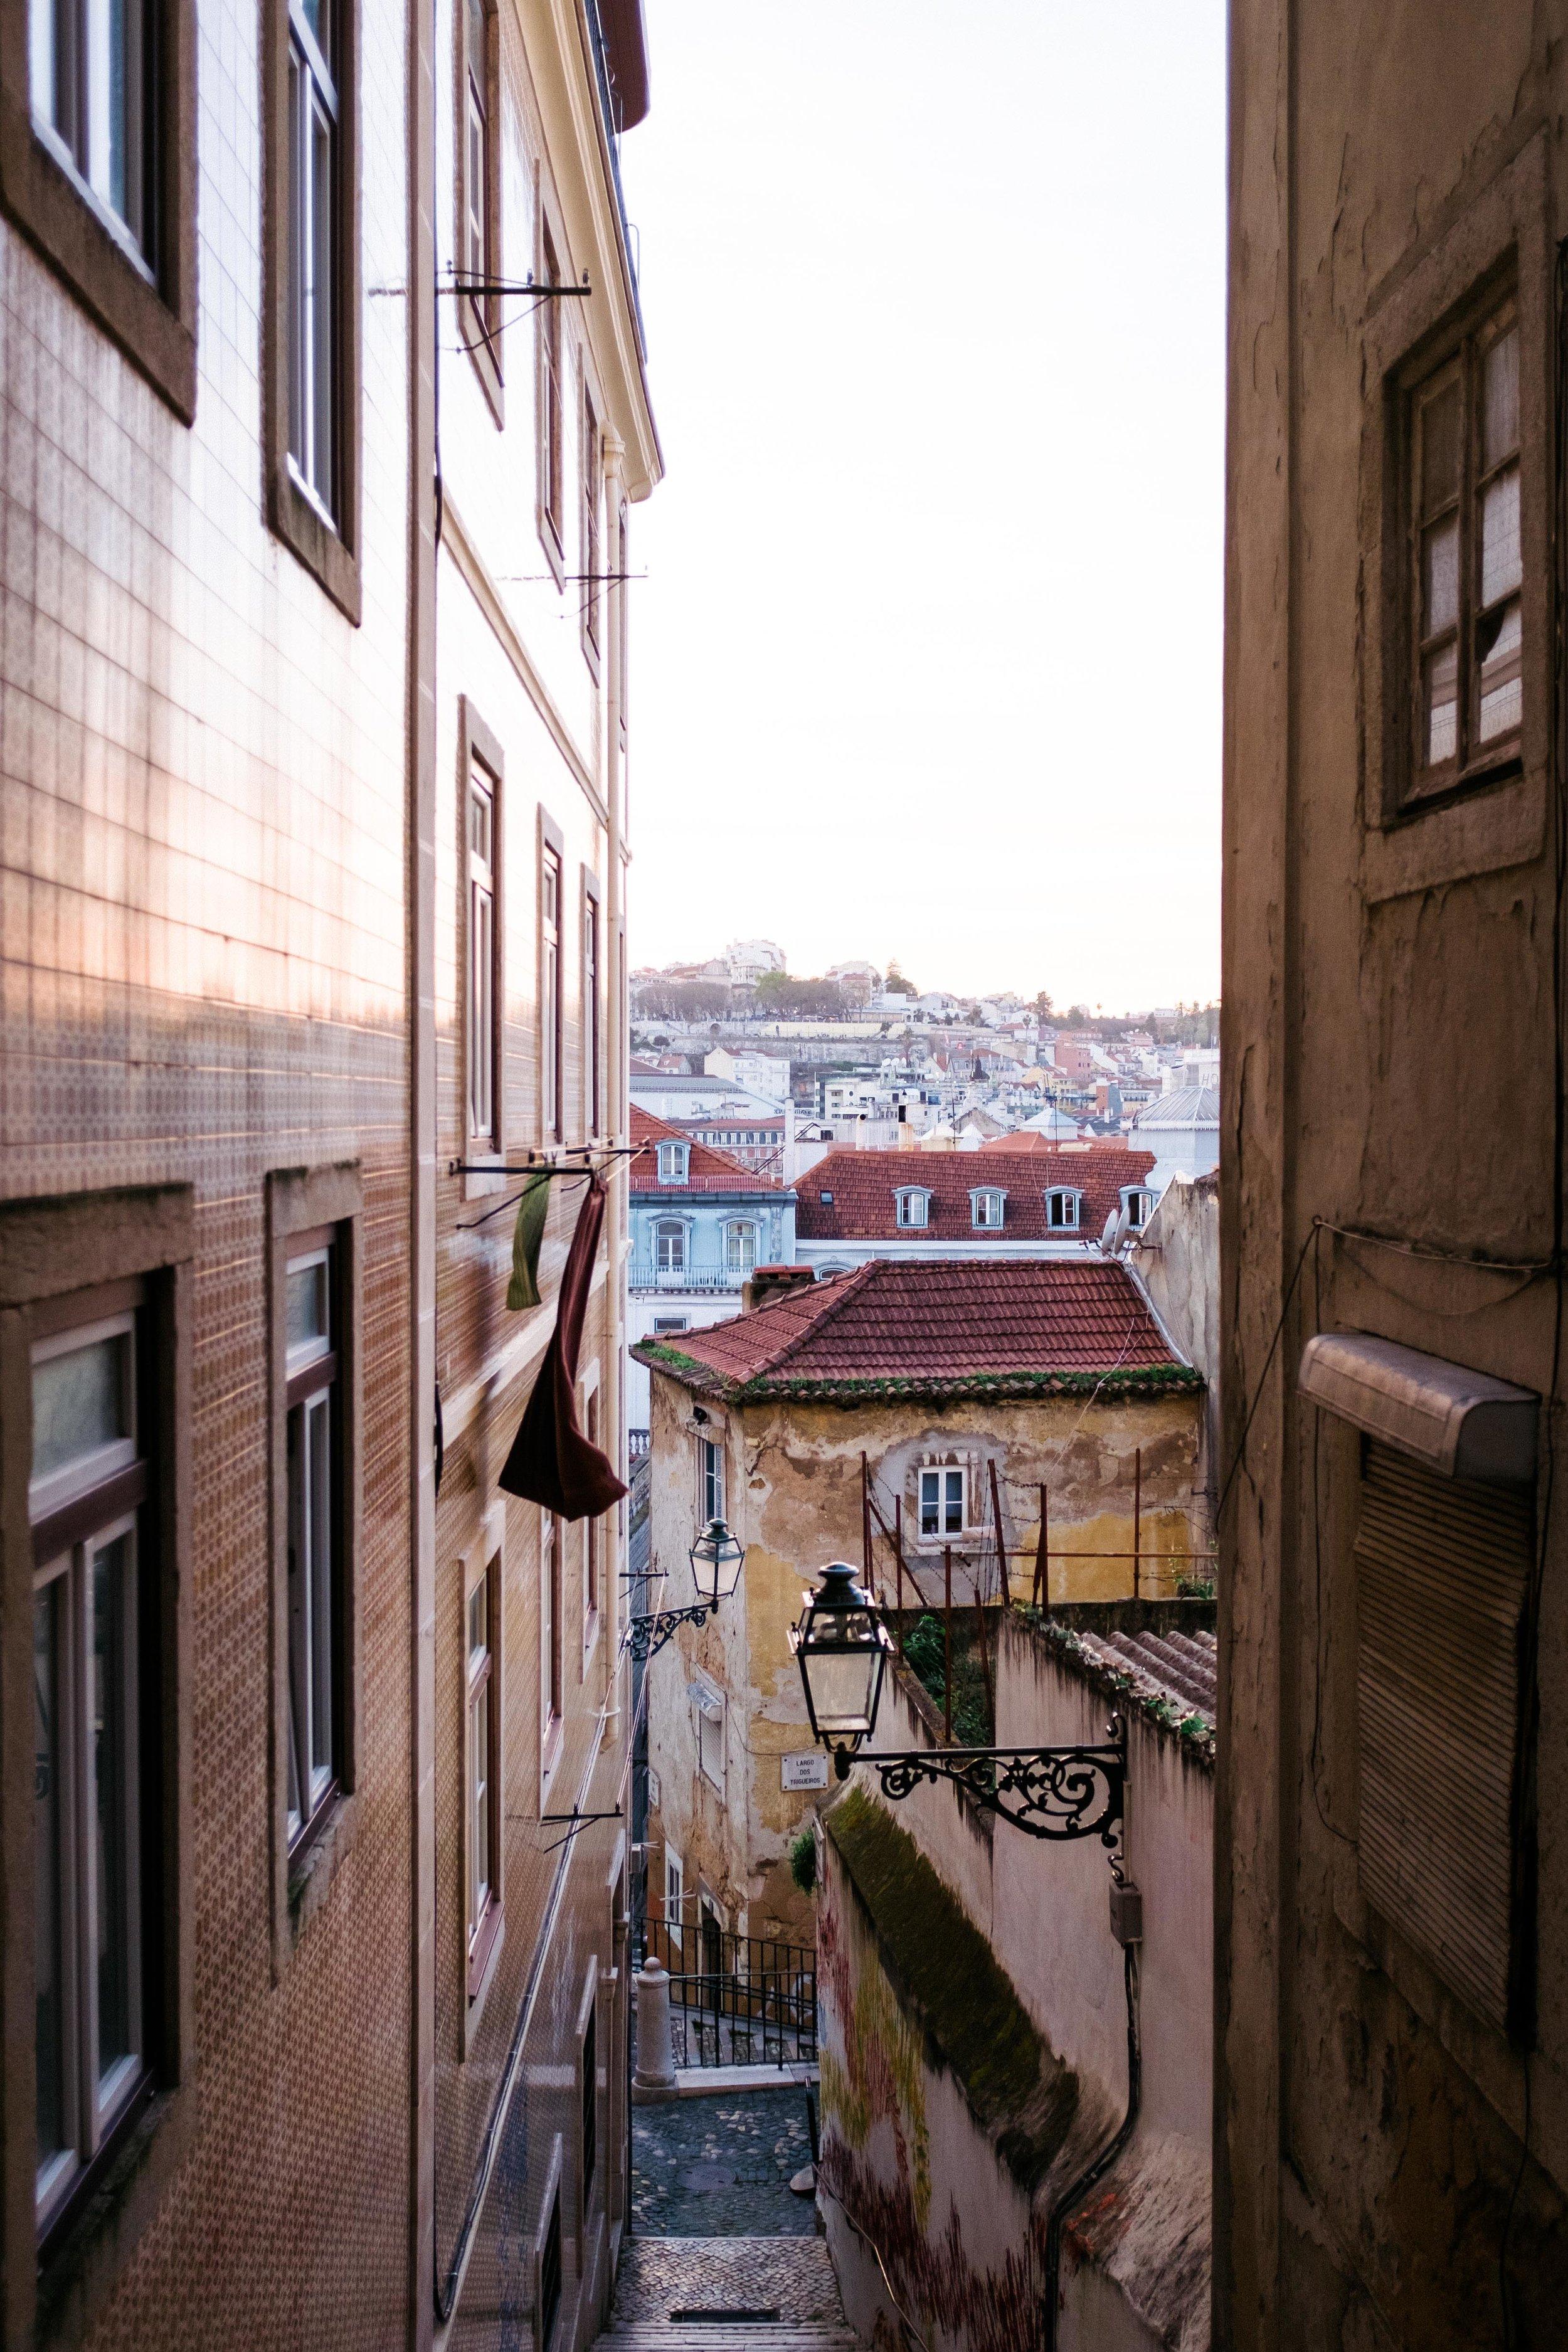 lisbon-portugal-golden-hour-view